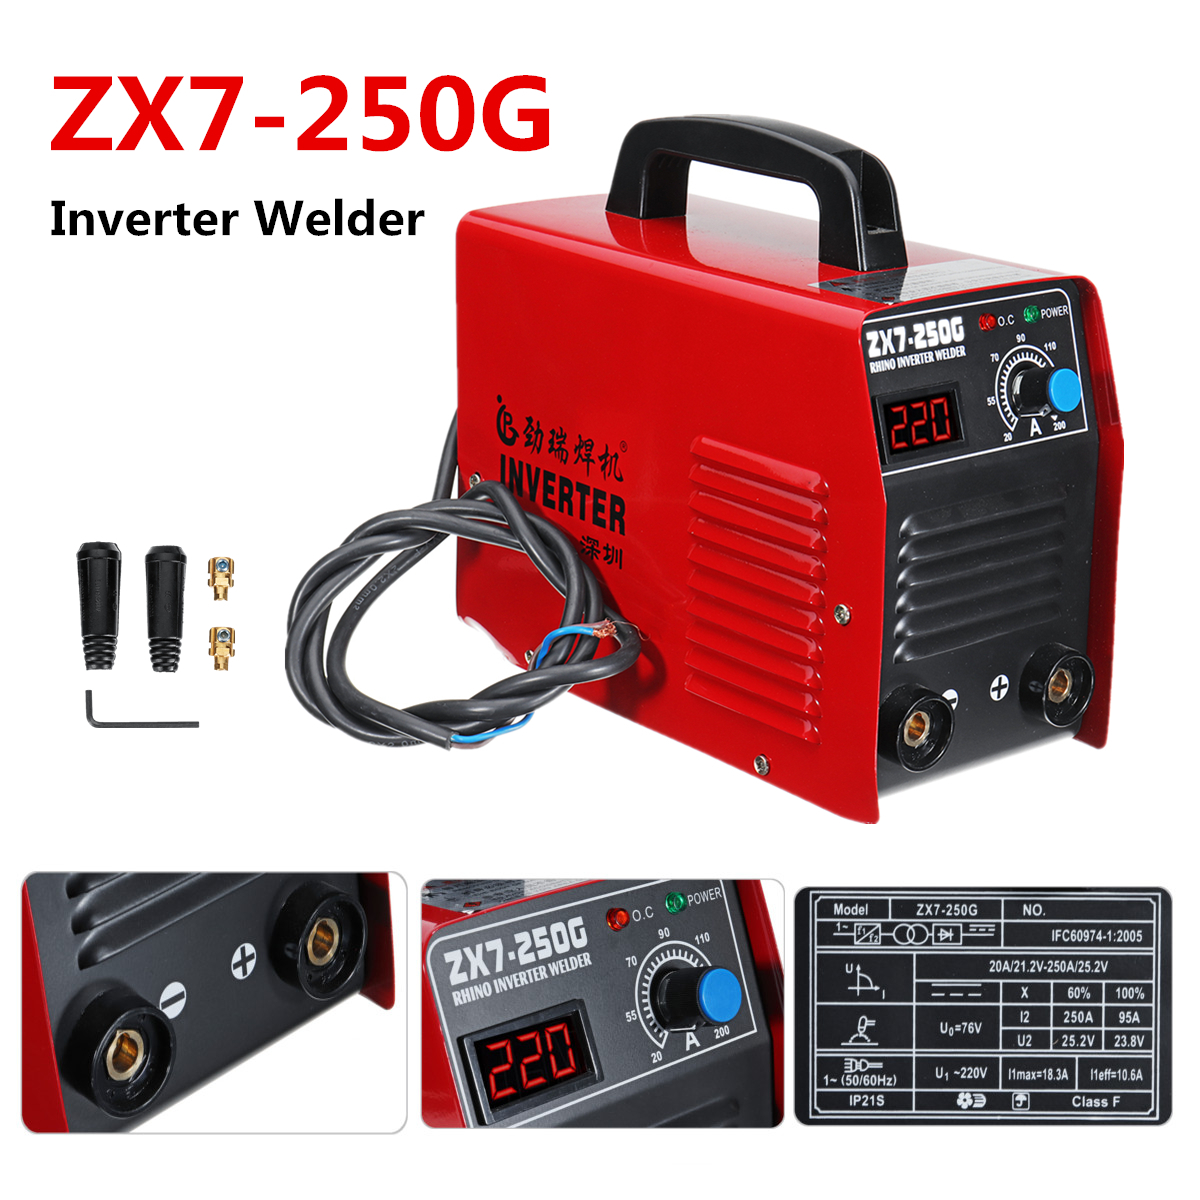 Jasic Compact Zx7 200e Igbt Portable Mma Welder Welding Machines Rilon Arc 160 Mesin Las Inverter Ac 220v 1 Phase 250g 200amp 60w Machine